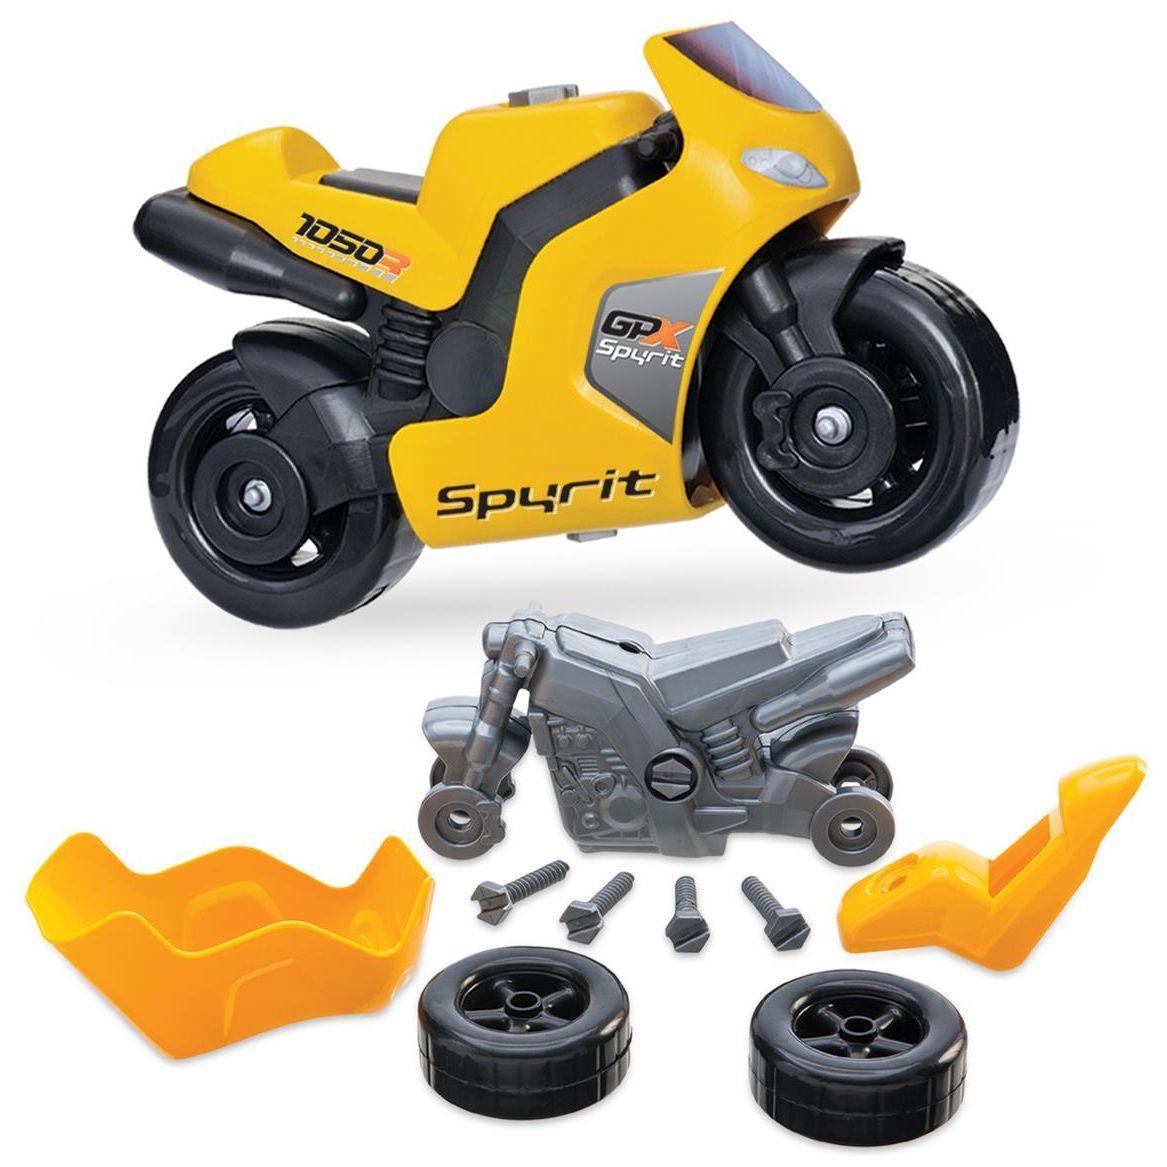 e0c03e04cc4 Conjunto Moto Spyrit Com Ferramentas - Usual Plastic - - - Magazine Luiza